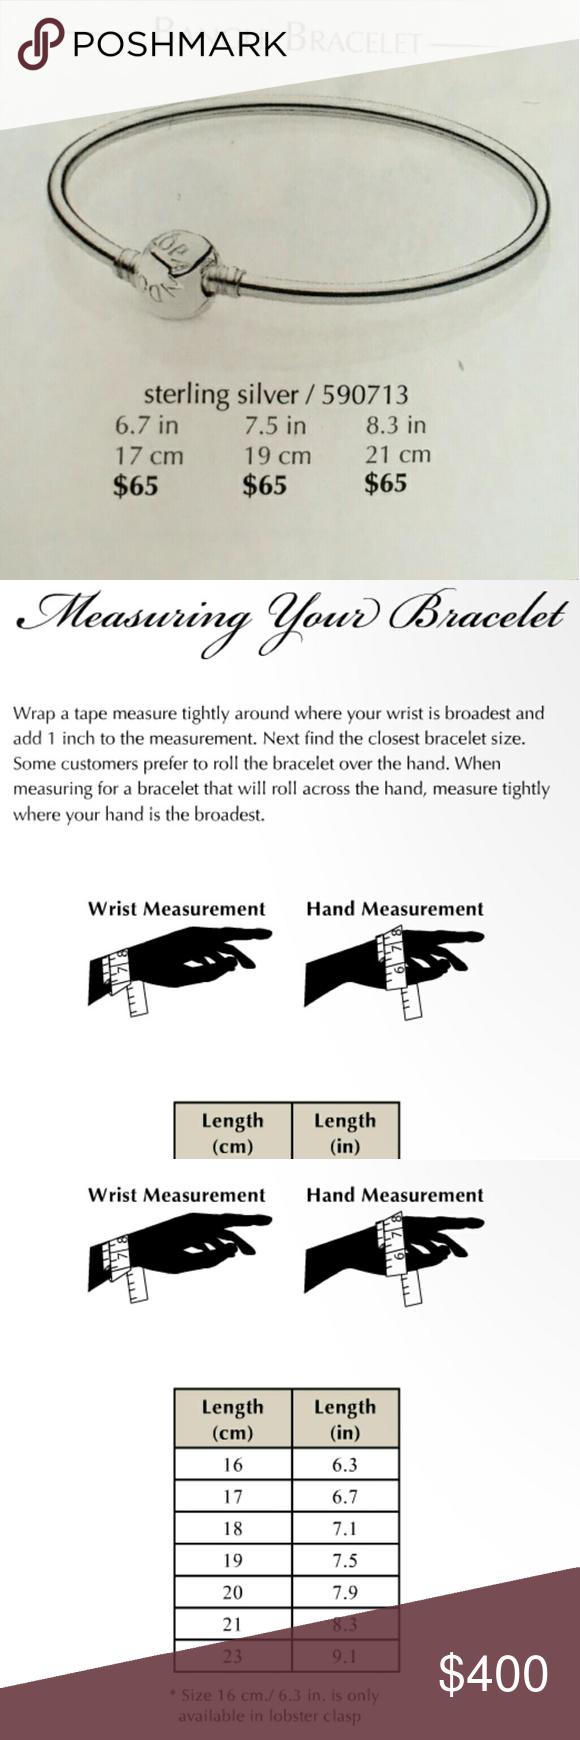 How To Measure A Pandora Bangle Guide To Measuring Pandora Bangles Pandora Accessories Pandora Bangle Pandora Accessories Bracelet Sizes